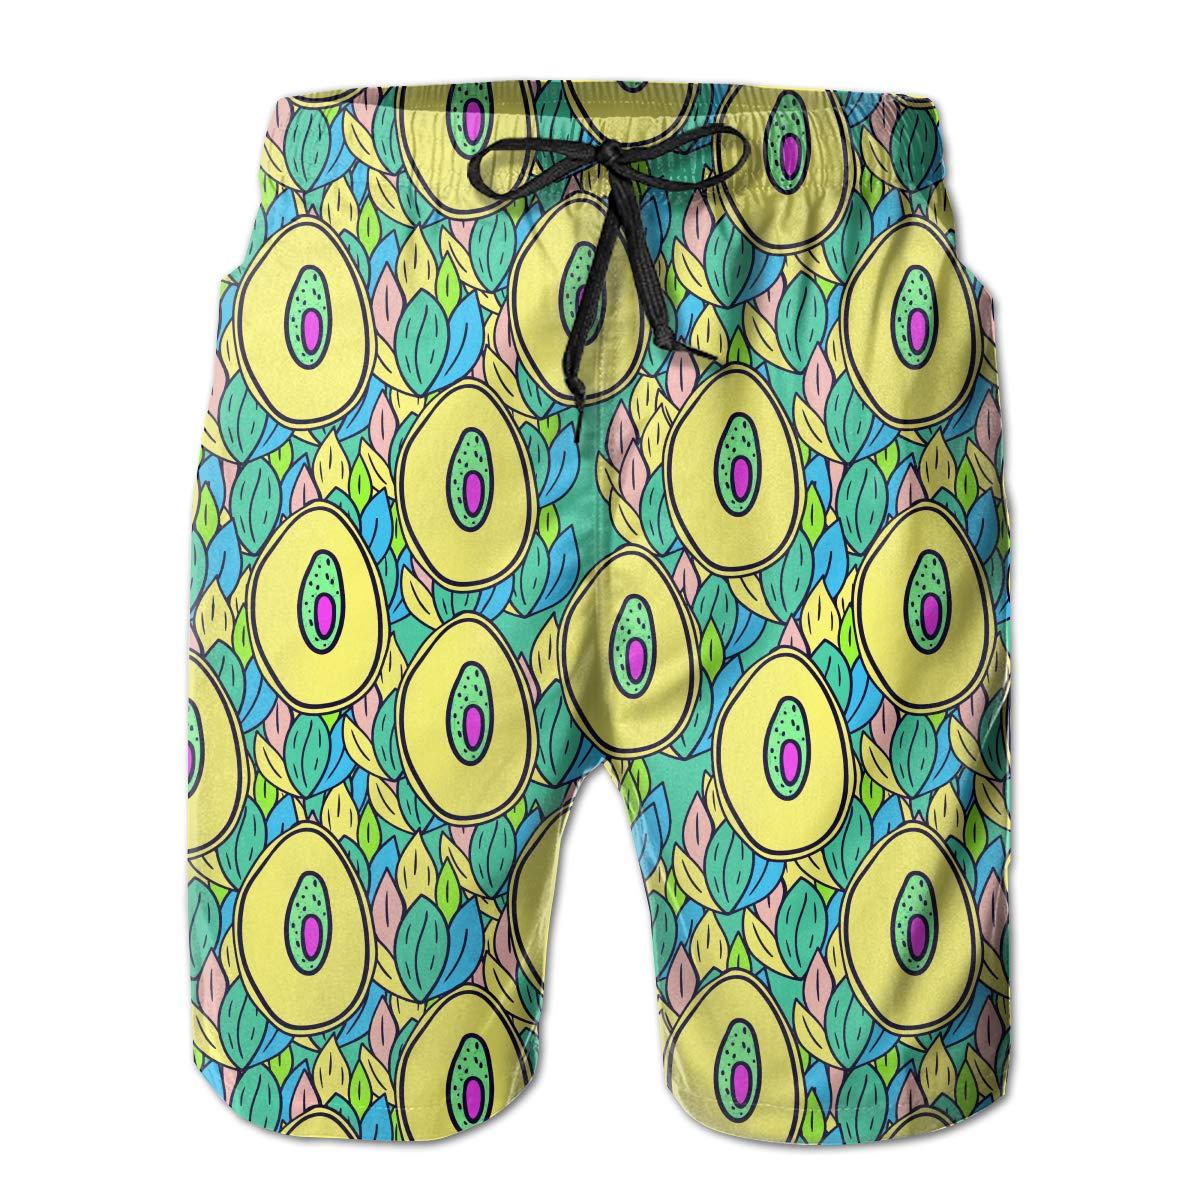 Mens Fruit Avocado Casual Quick Dry Swim Trunks Elastic Drawstring Swim Shorts with Pocket